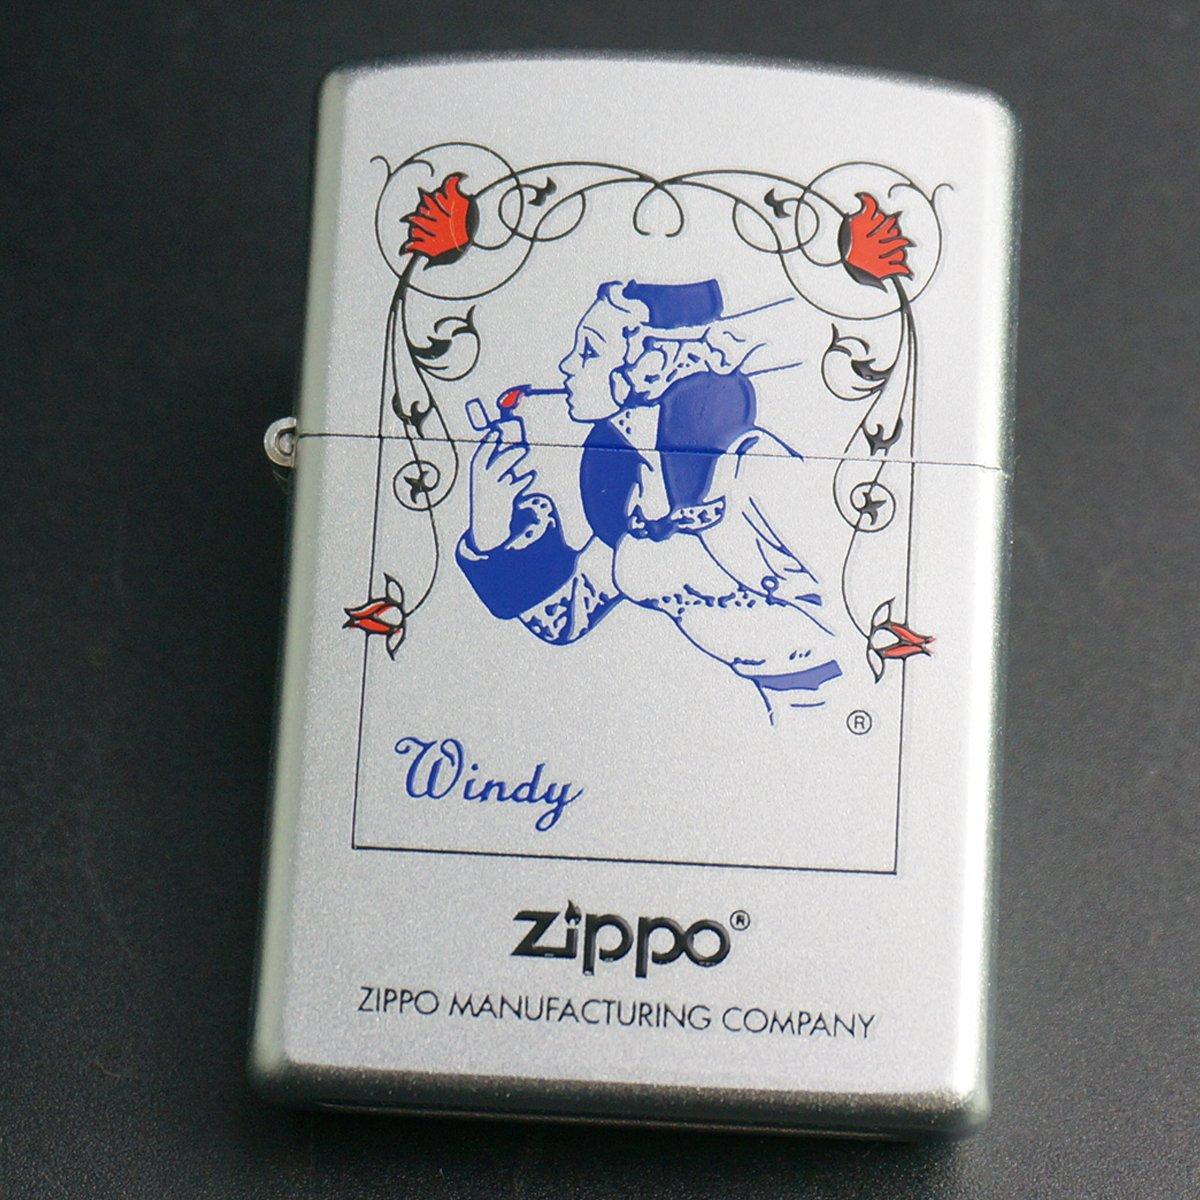 zippo WINDY プリント #205 2001年製造 B06XW3YSWH